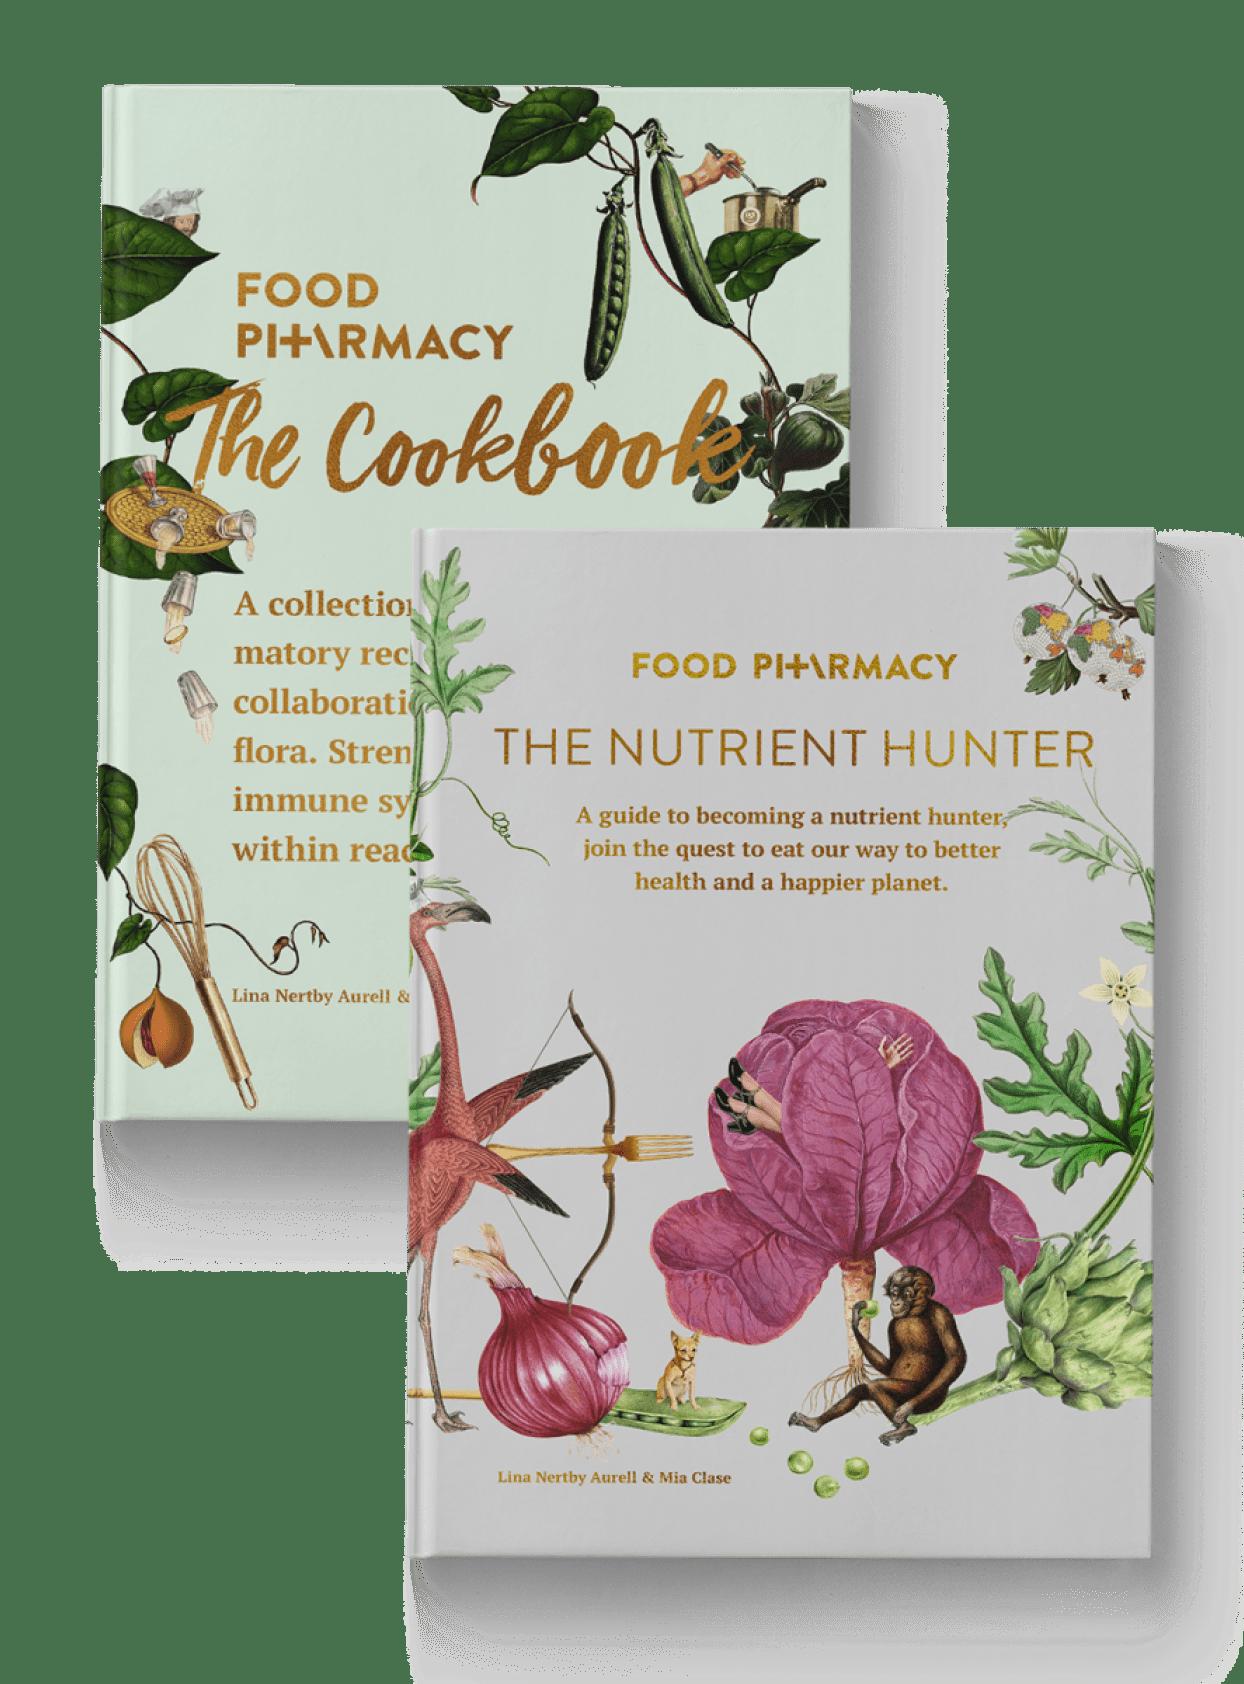 Cookbook + nutrient hunter book